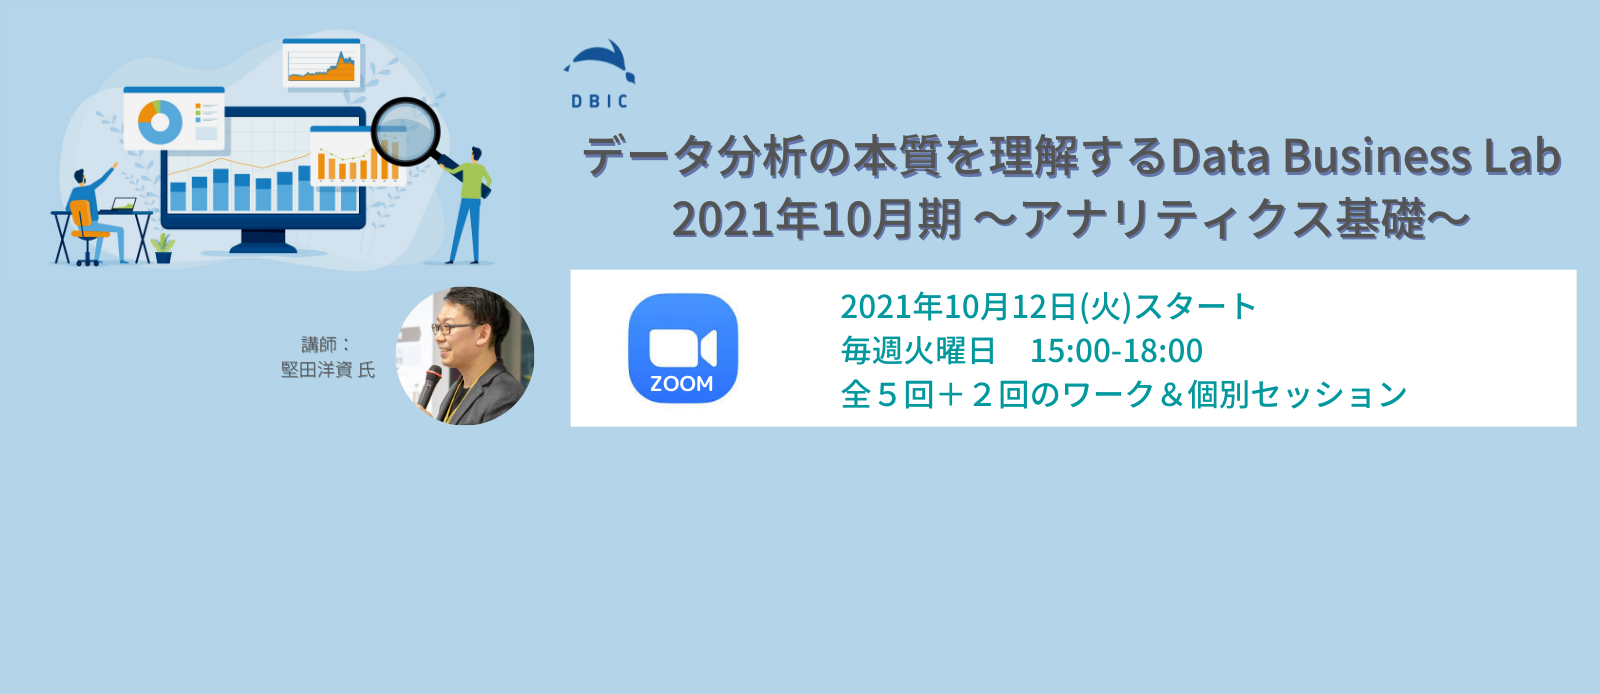 「Data Business Lab 2021 アナリティクス基礎 2021年10月期」開催